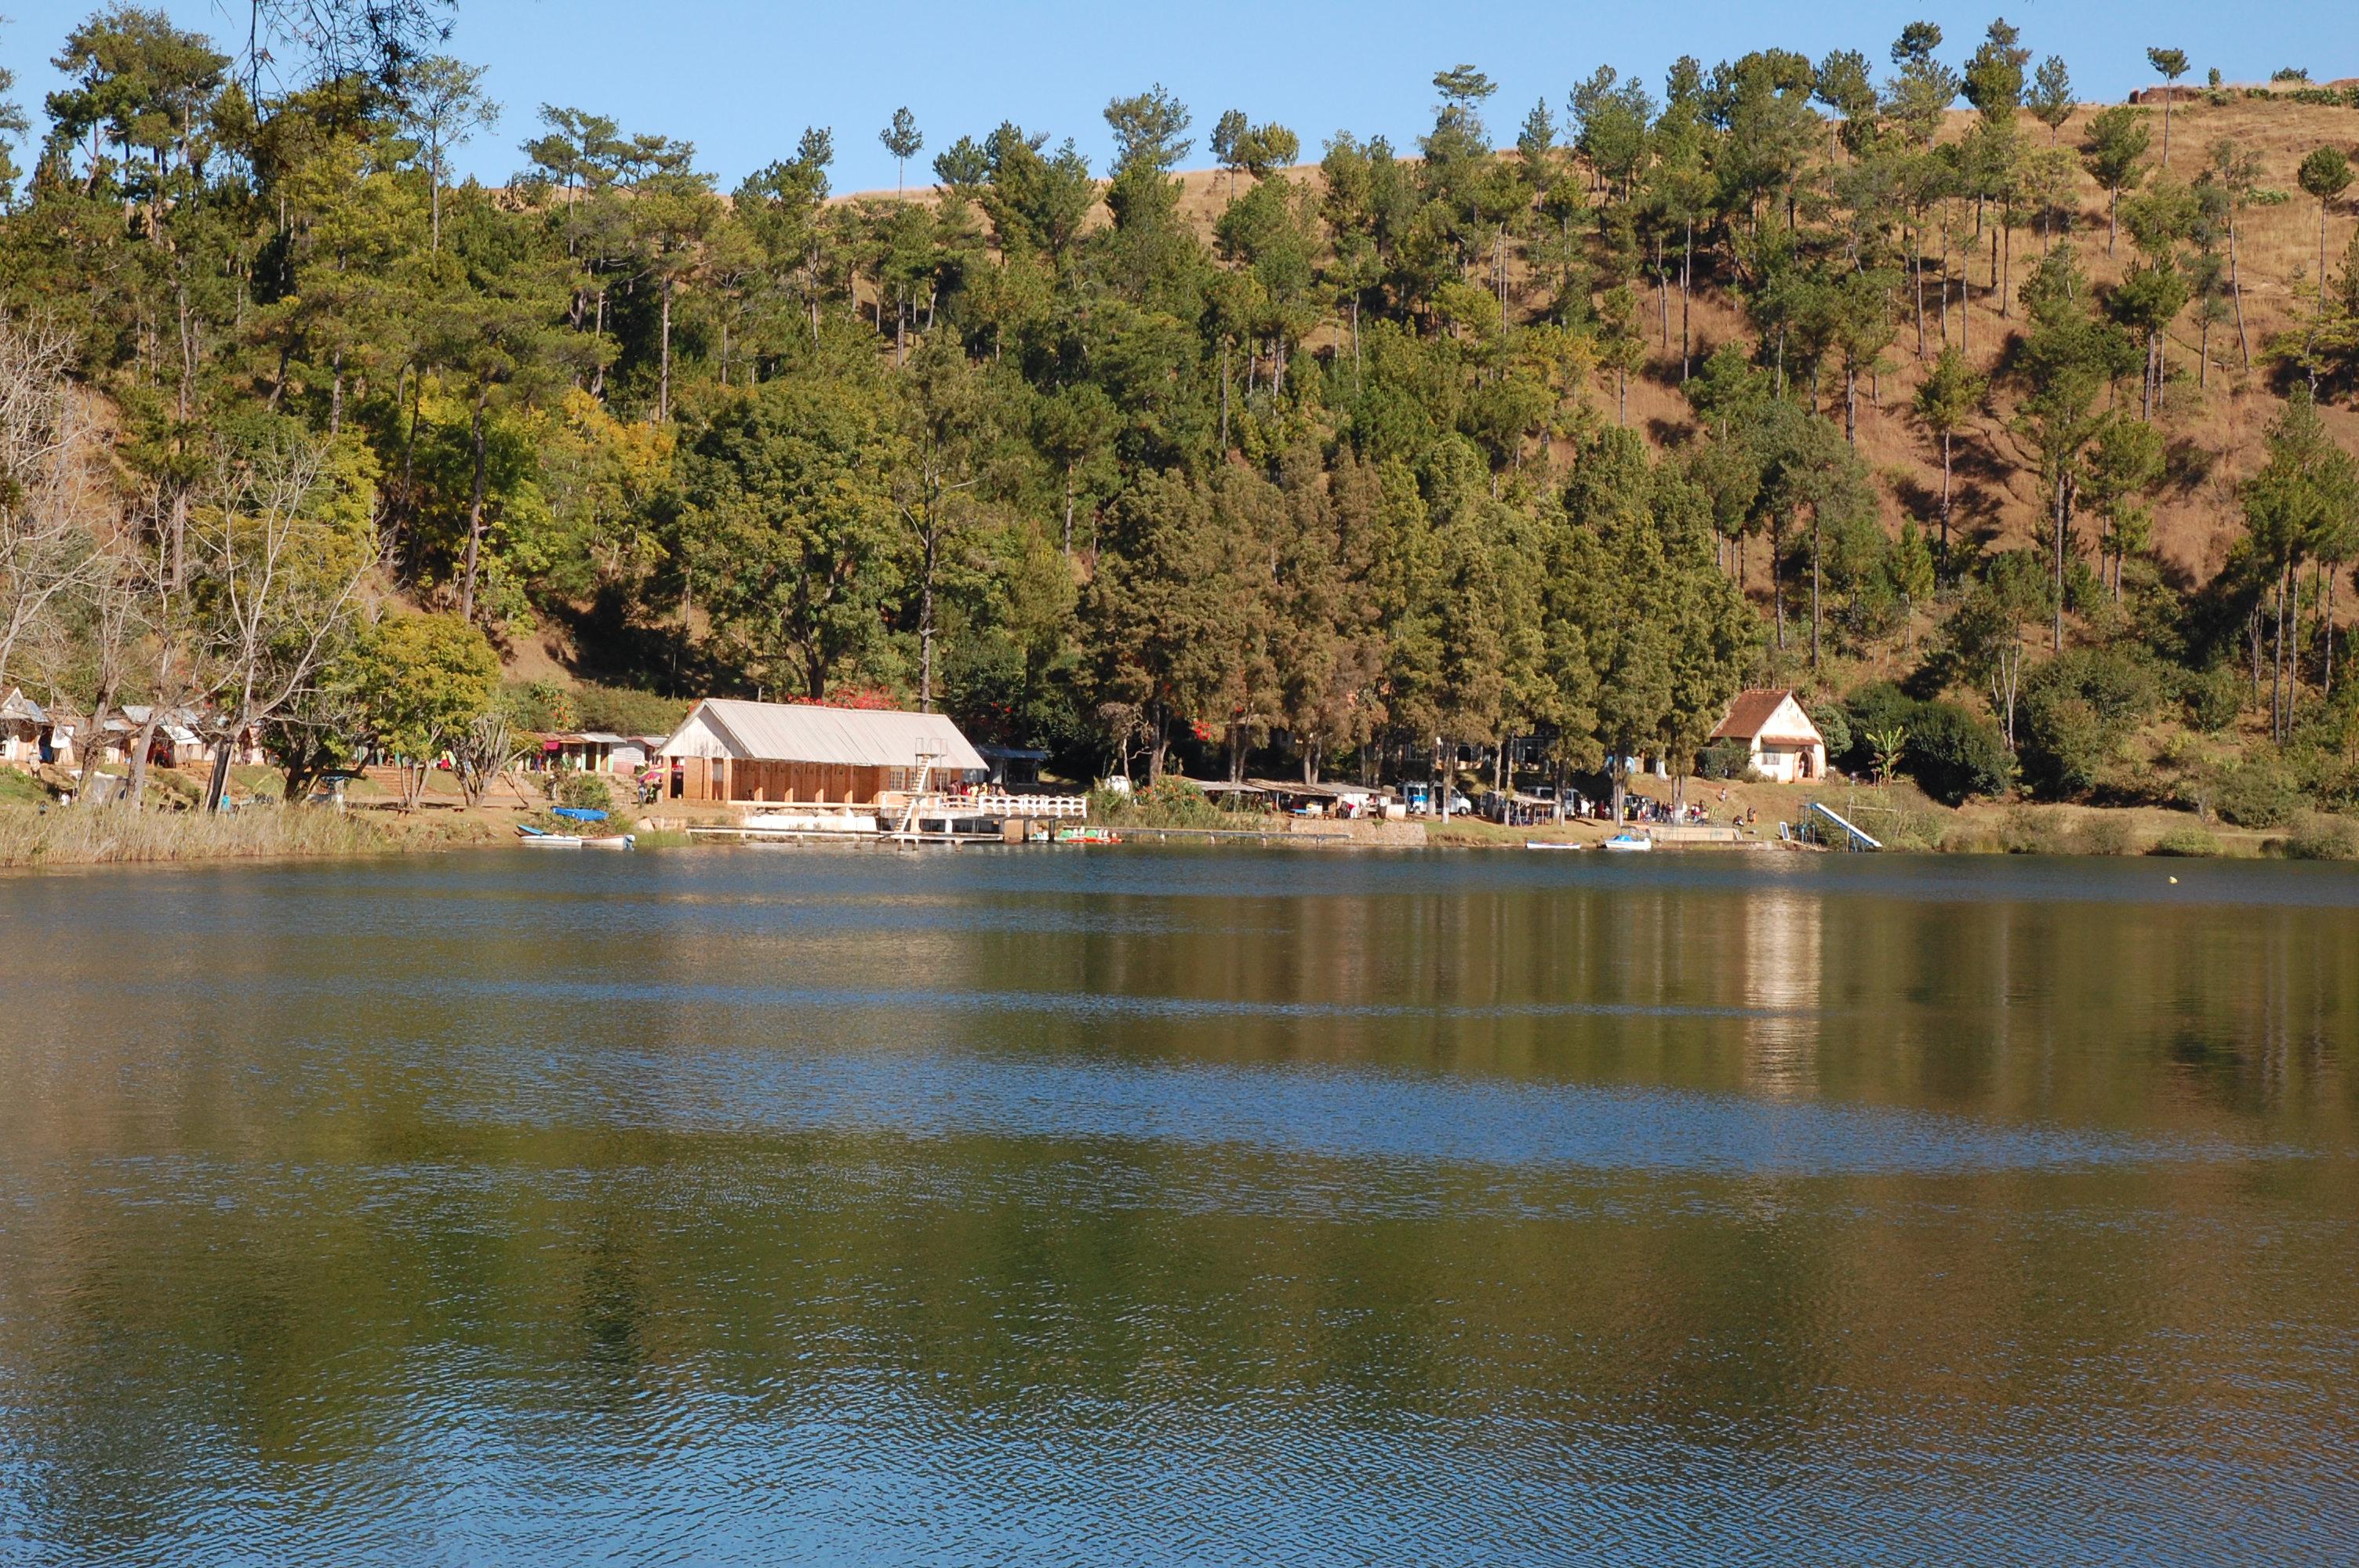 Lake Andrinkiba